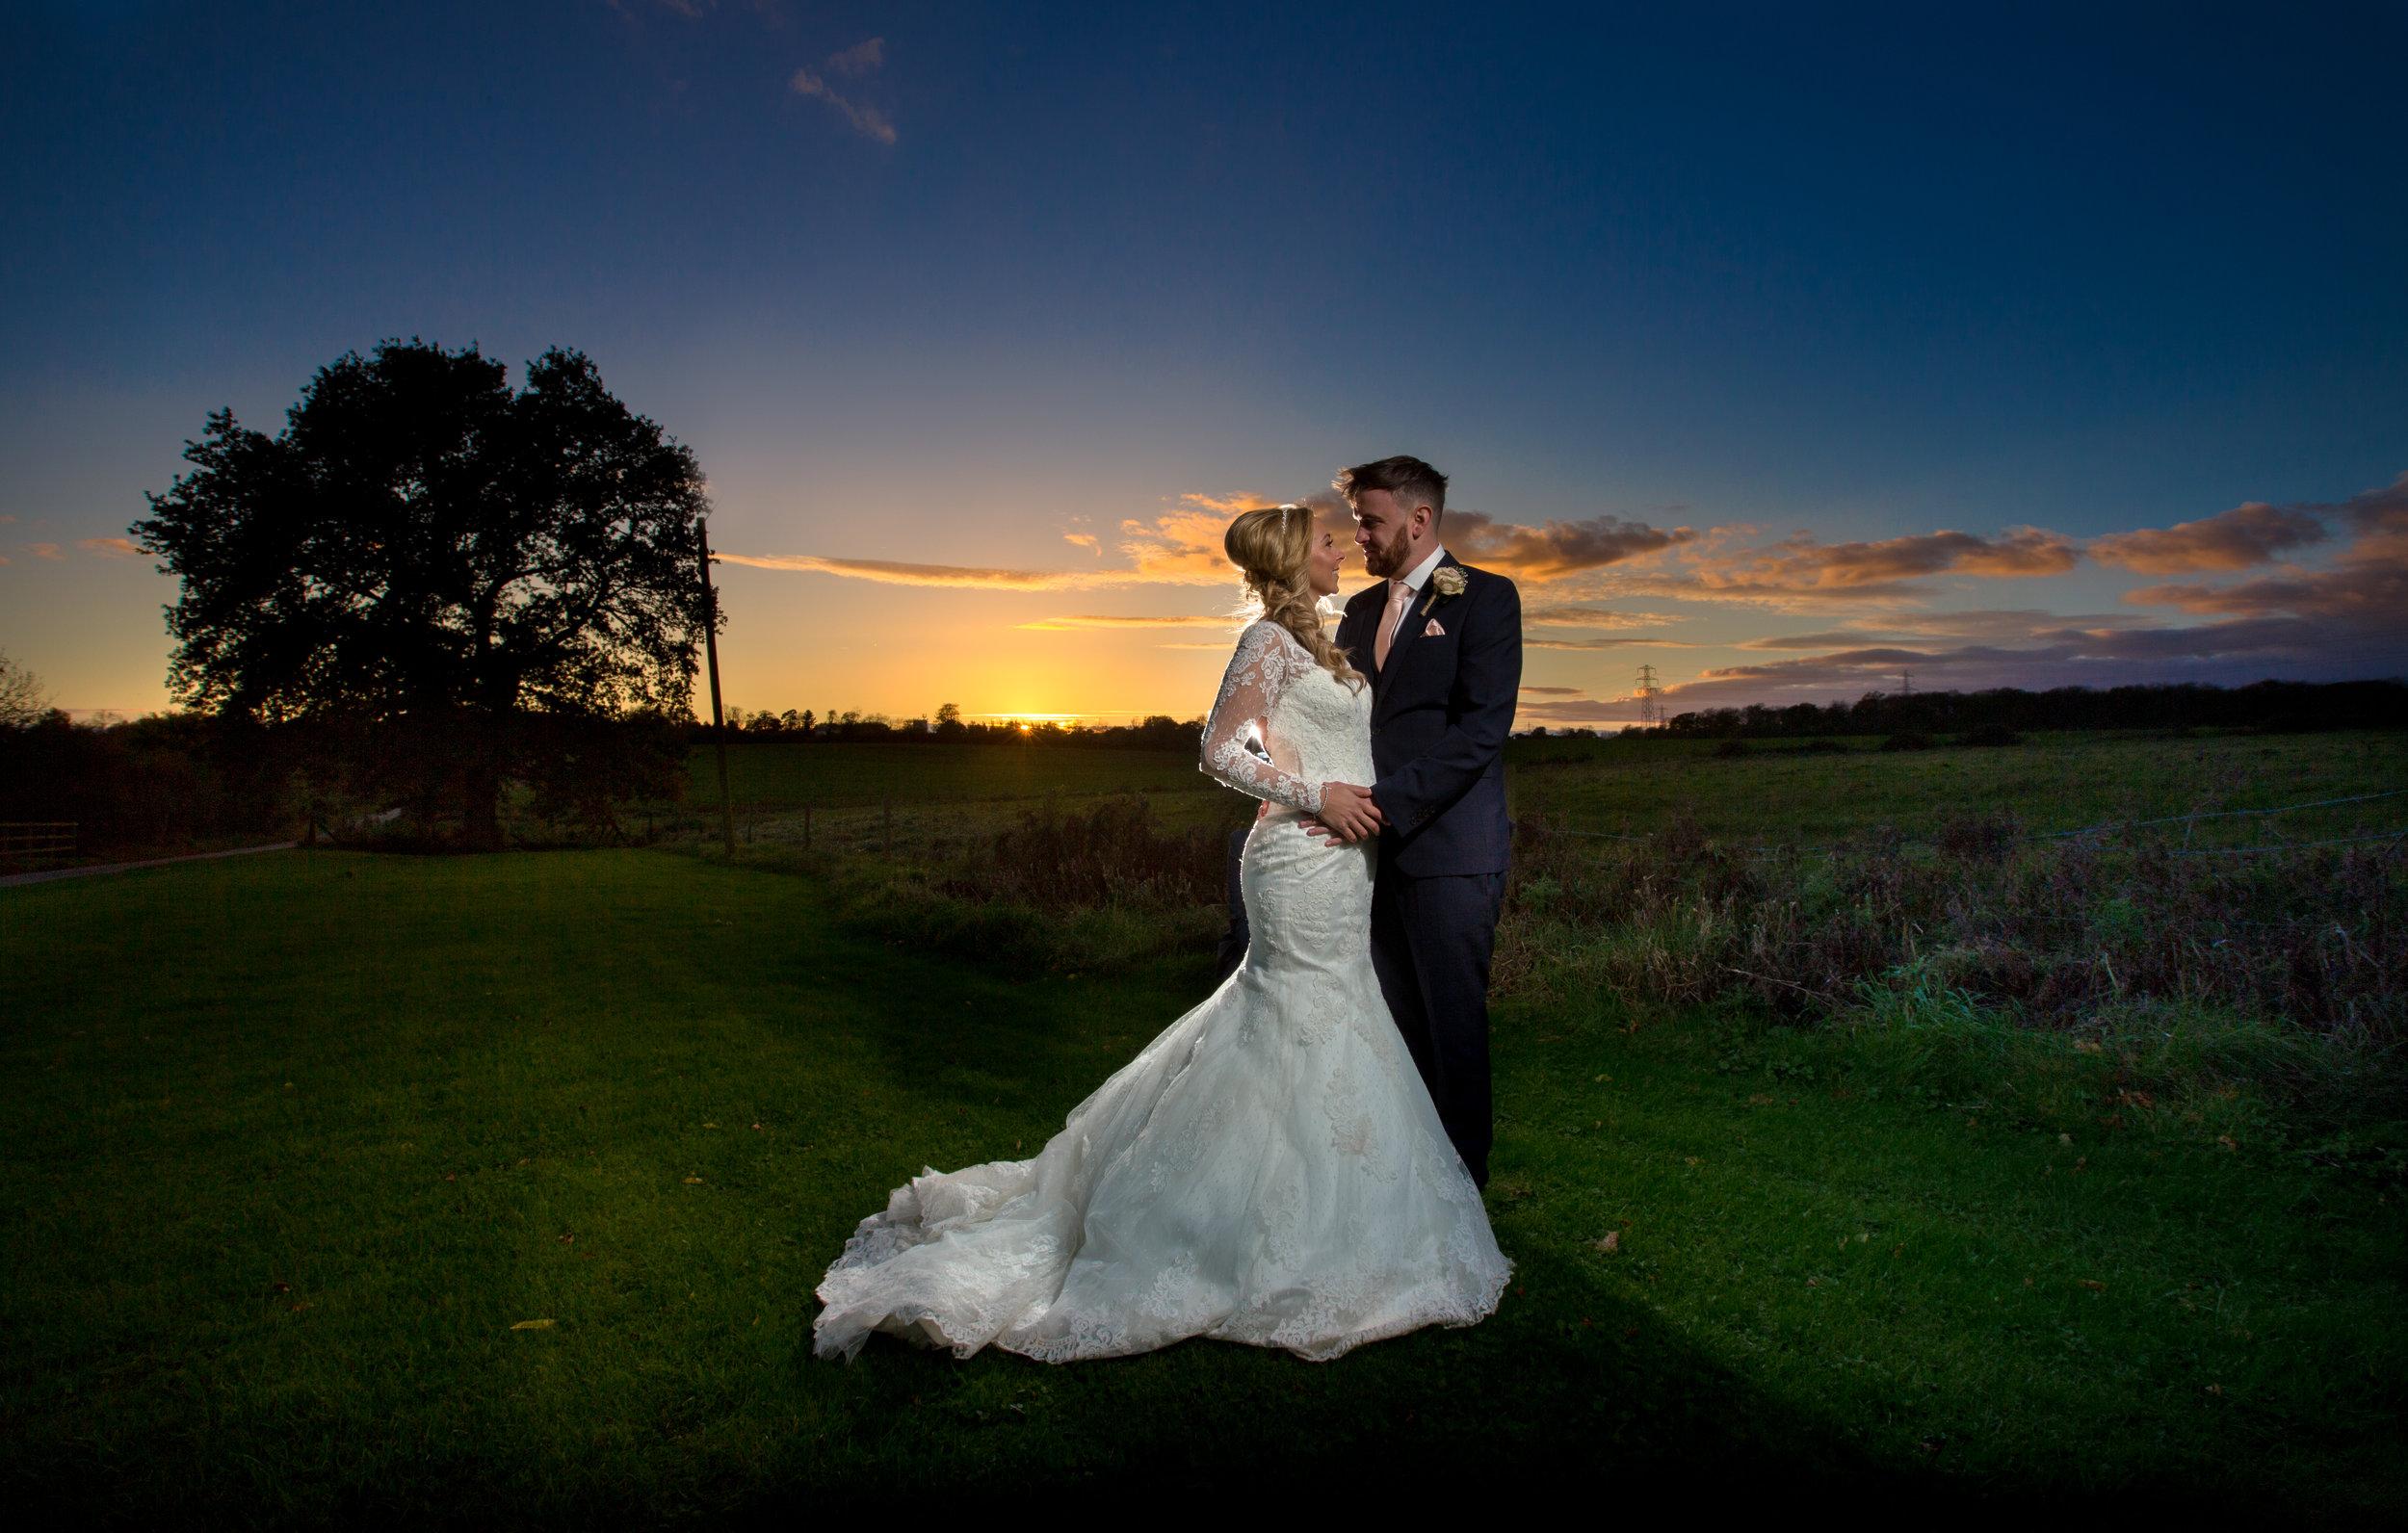 london-hertfordshire-wedding-photography-milling-barn-sunset-portrait-80